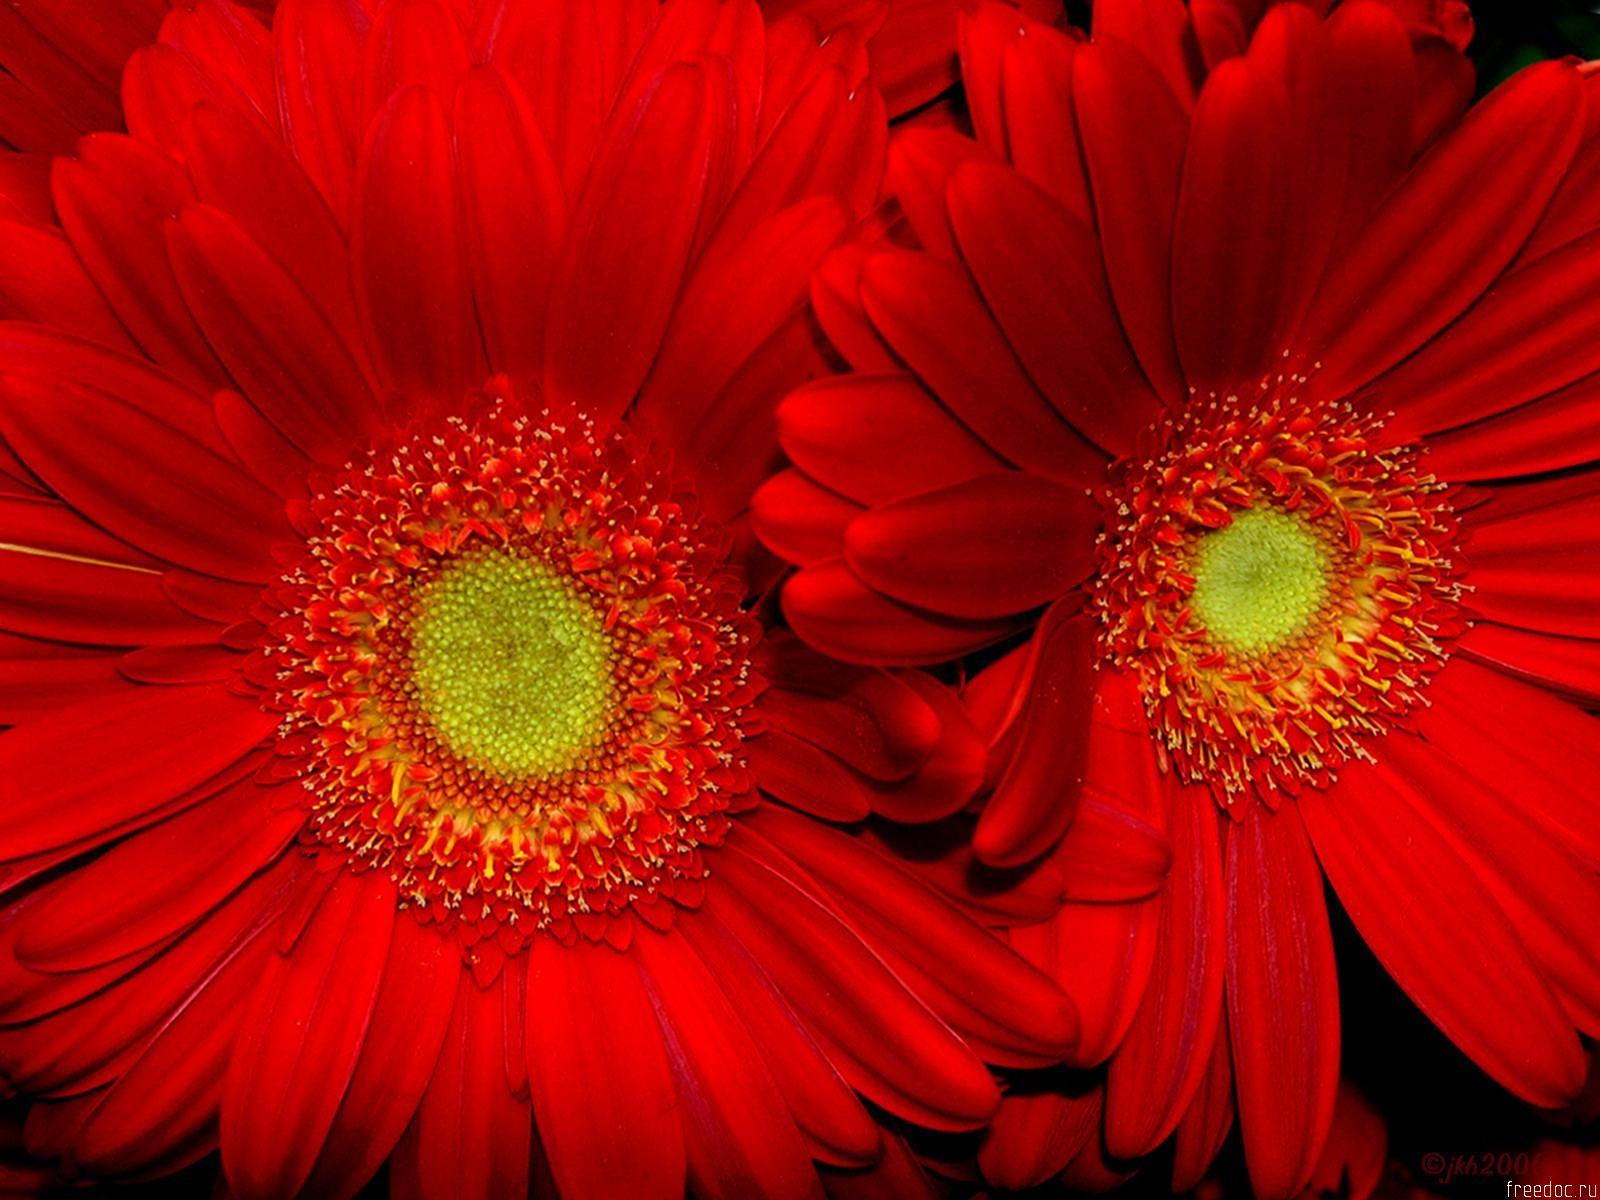 Image detail for Red Sun flower HD Wallpaper, Red Sun